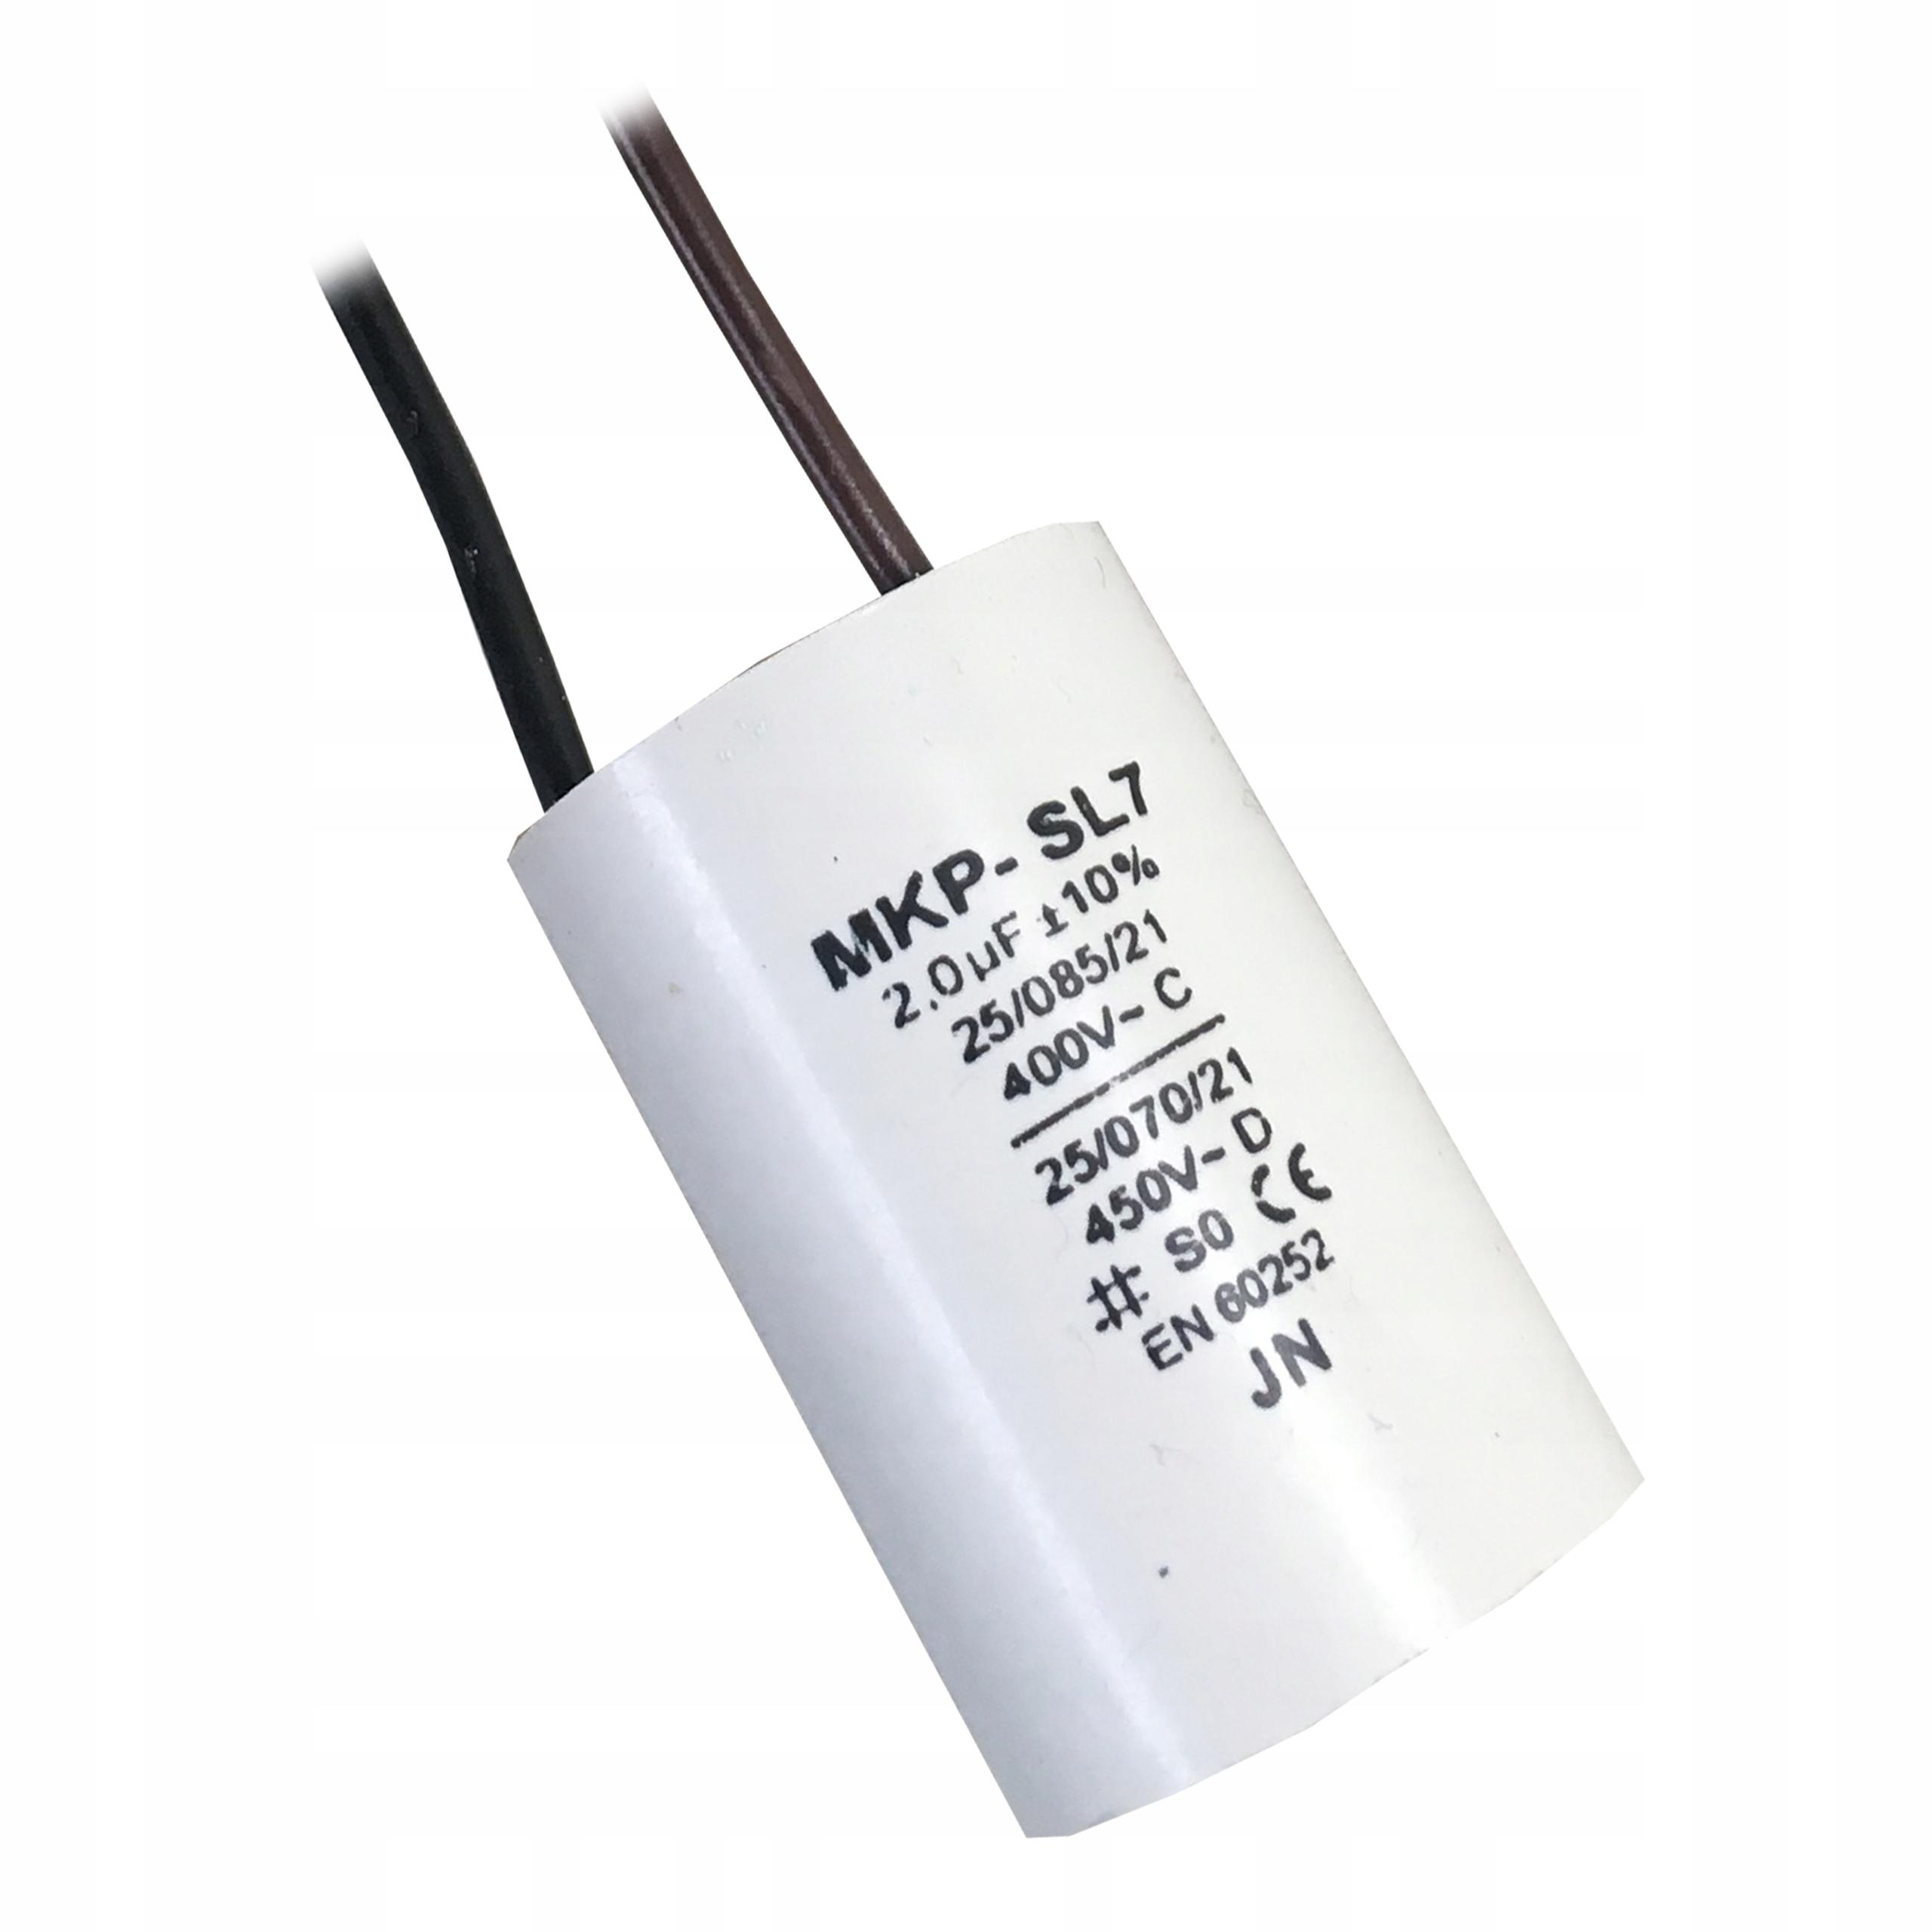 Пусковой конденсатор для вентилятора DM120 DM80 2uf